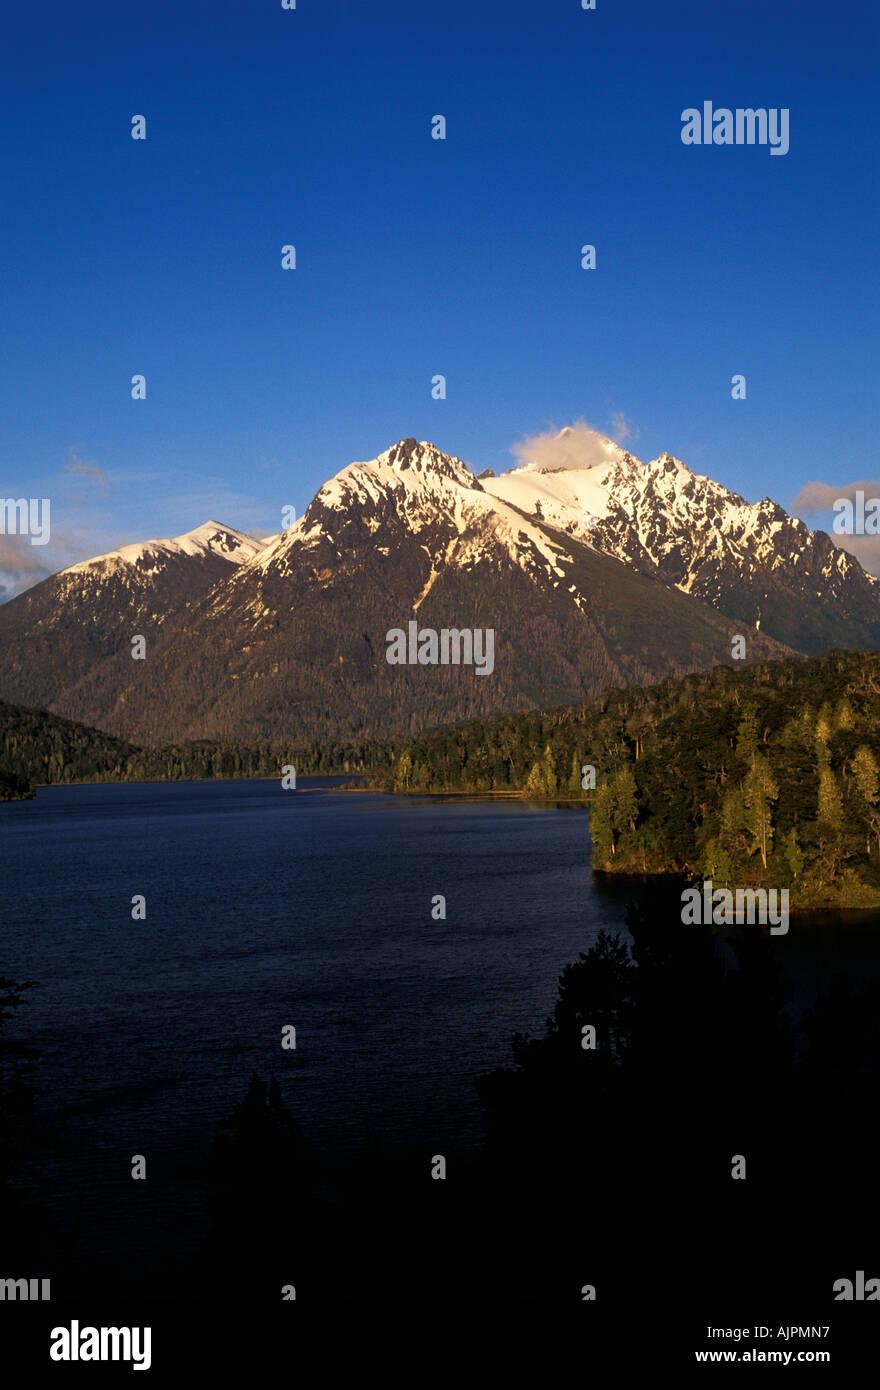 Lake Nahuel Huapi, Nahuel Huapi National Park, Andes Mountains, Rio Negro Province, Argentina, South America - Stock Image